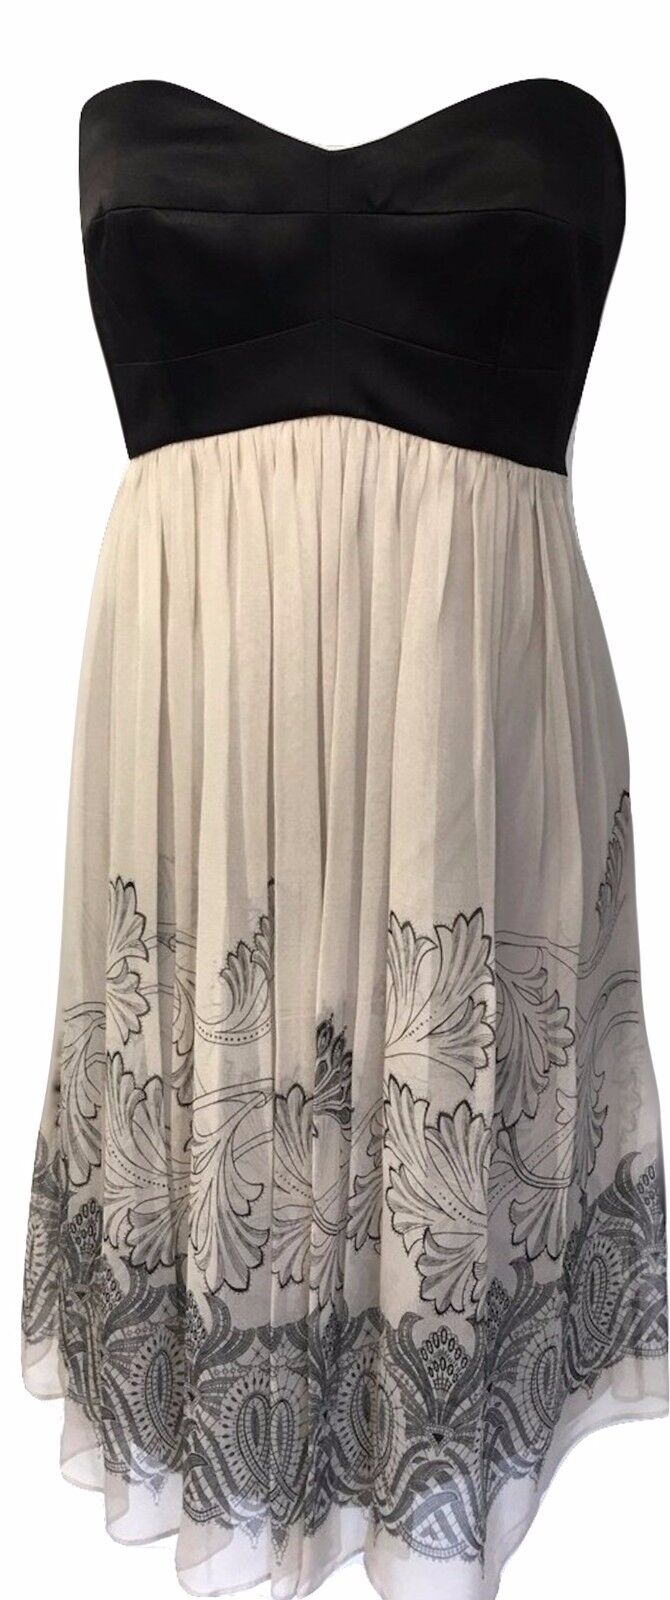 Karen Millen buscravater Oriental Imprimer Plissé Robe Beige Noir Femme Tailles UK